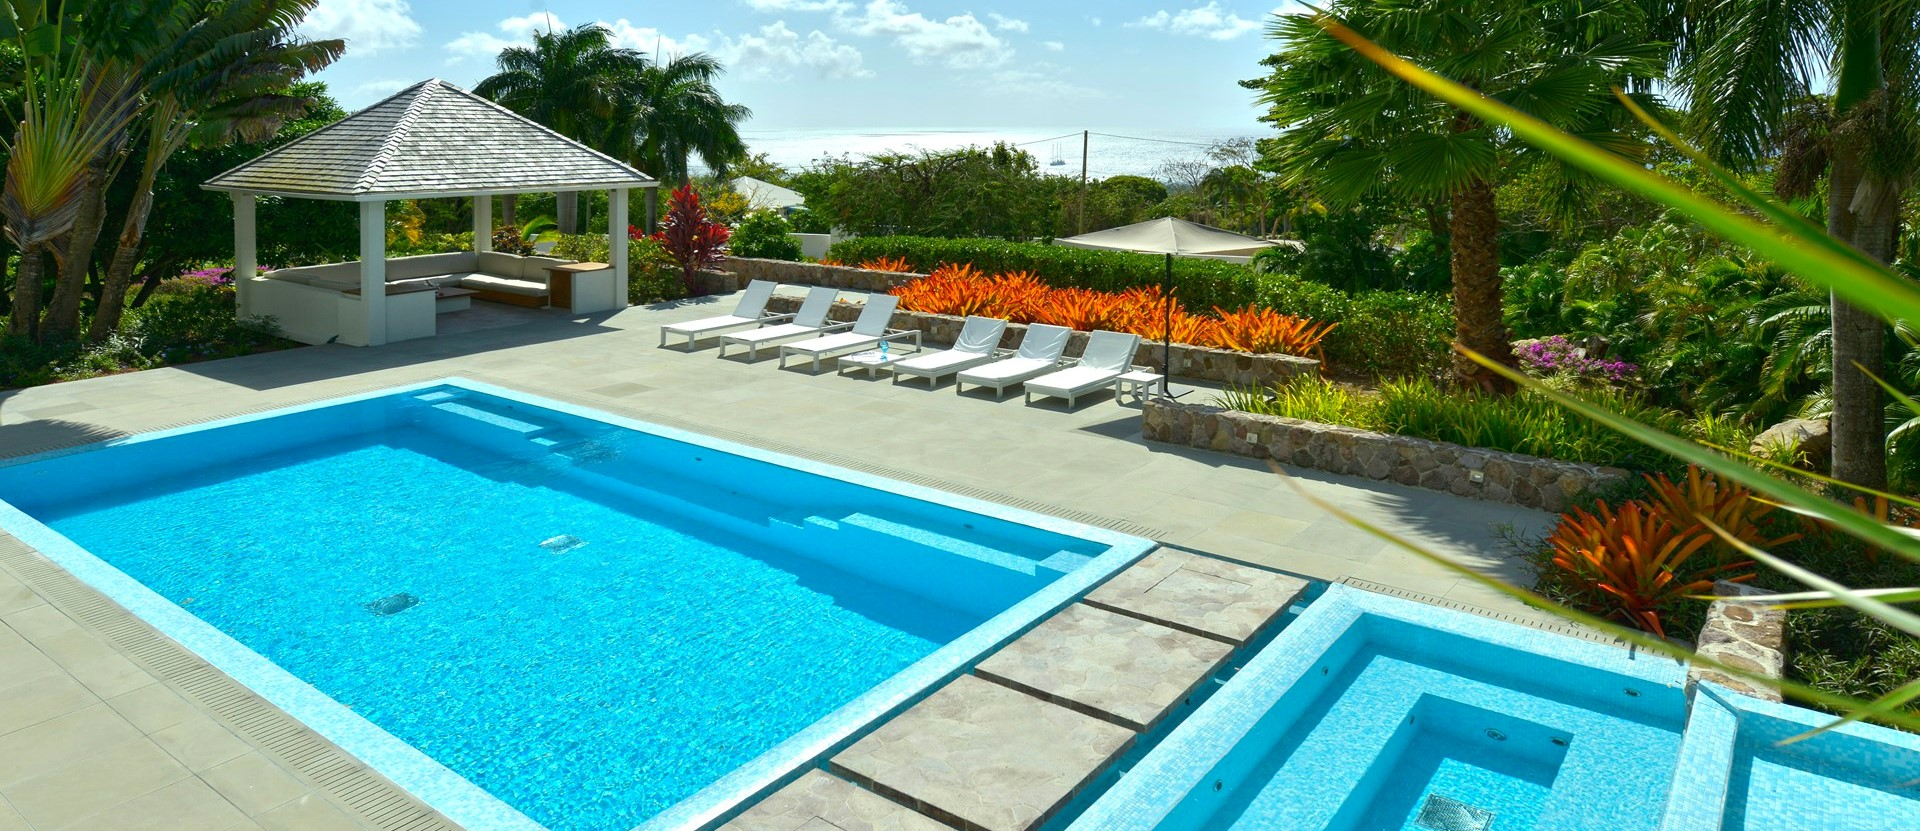 retreat-villa-nevis-caribbean-pools